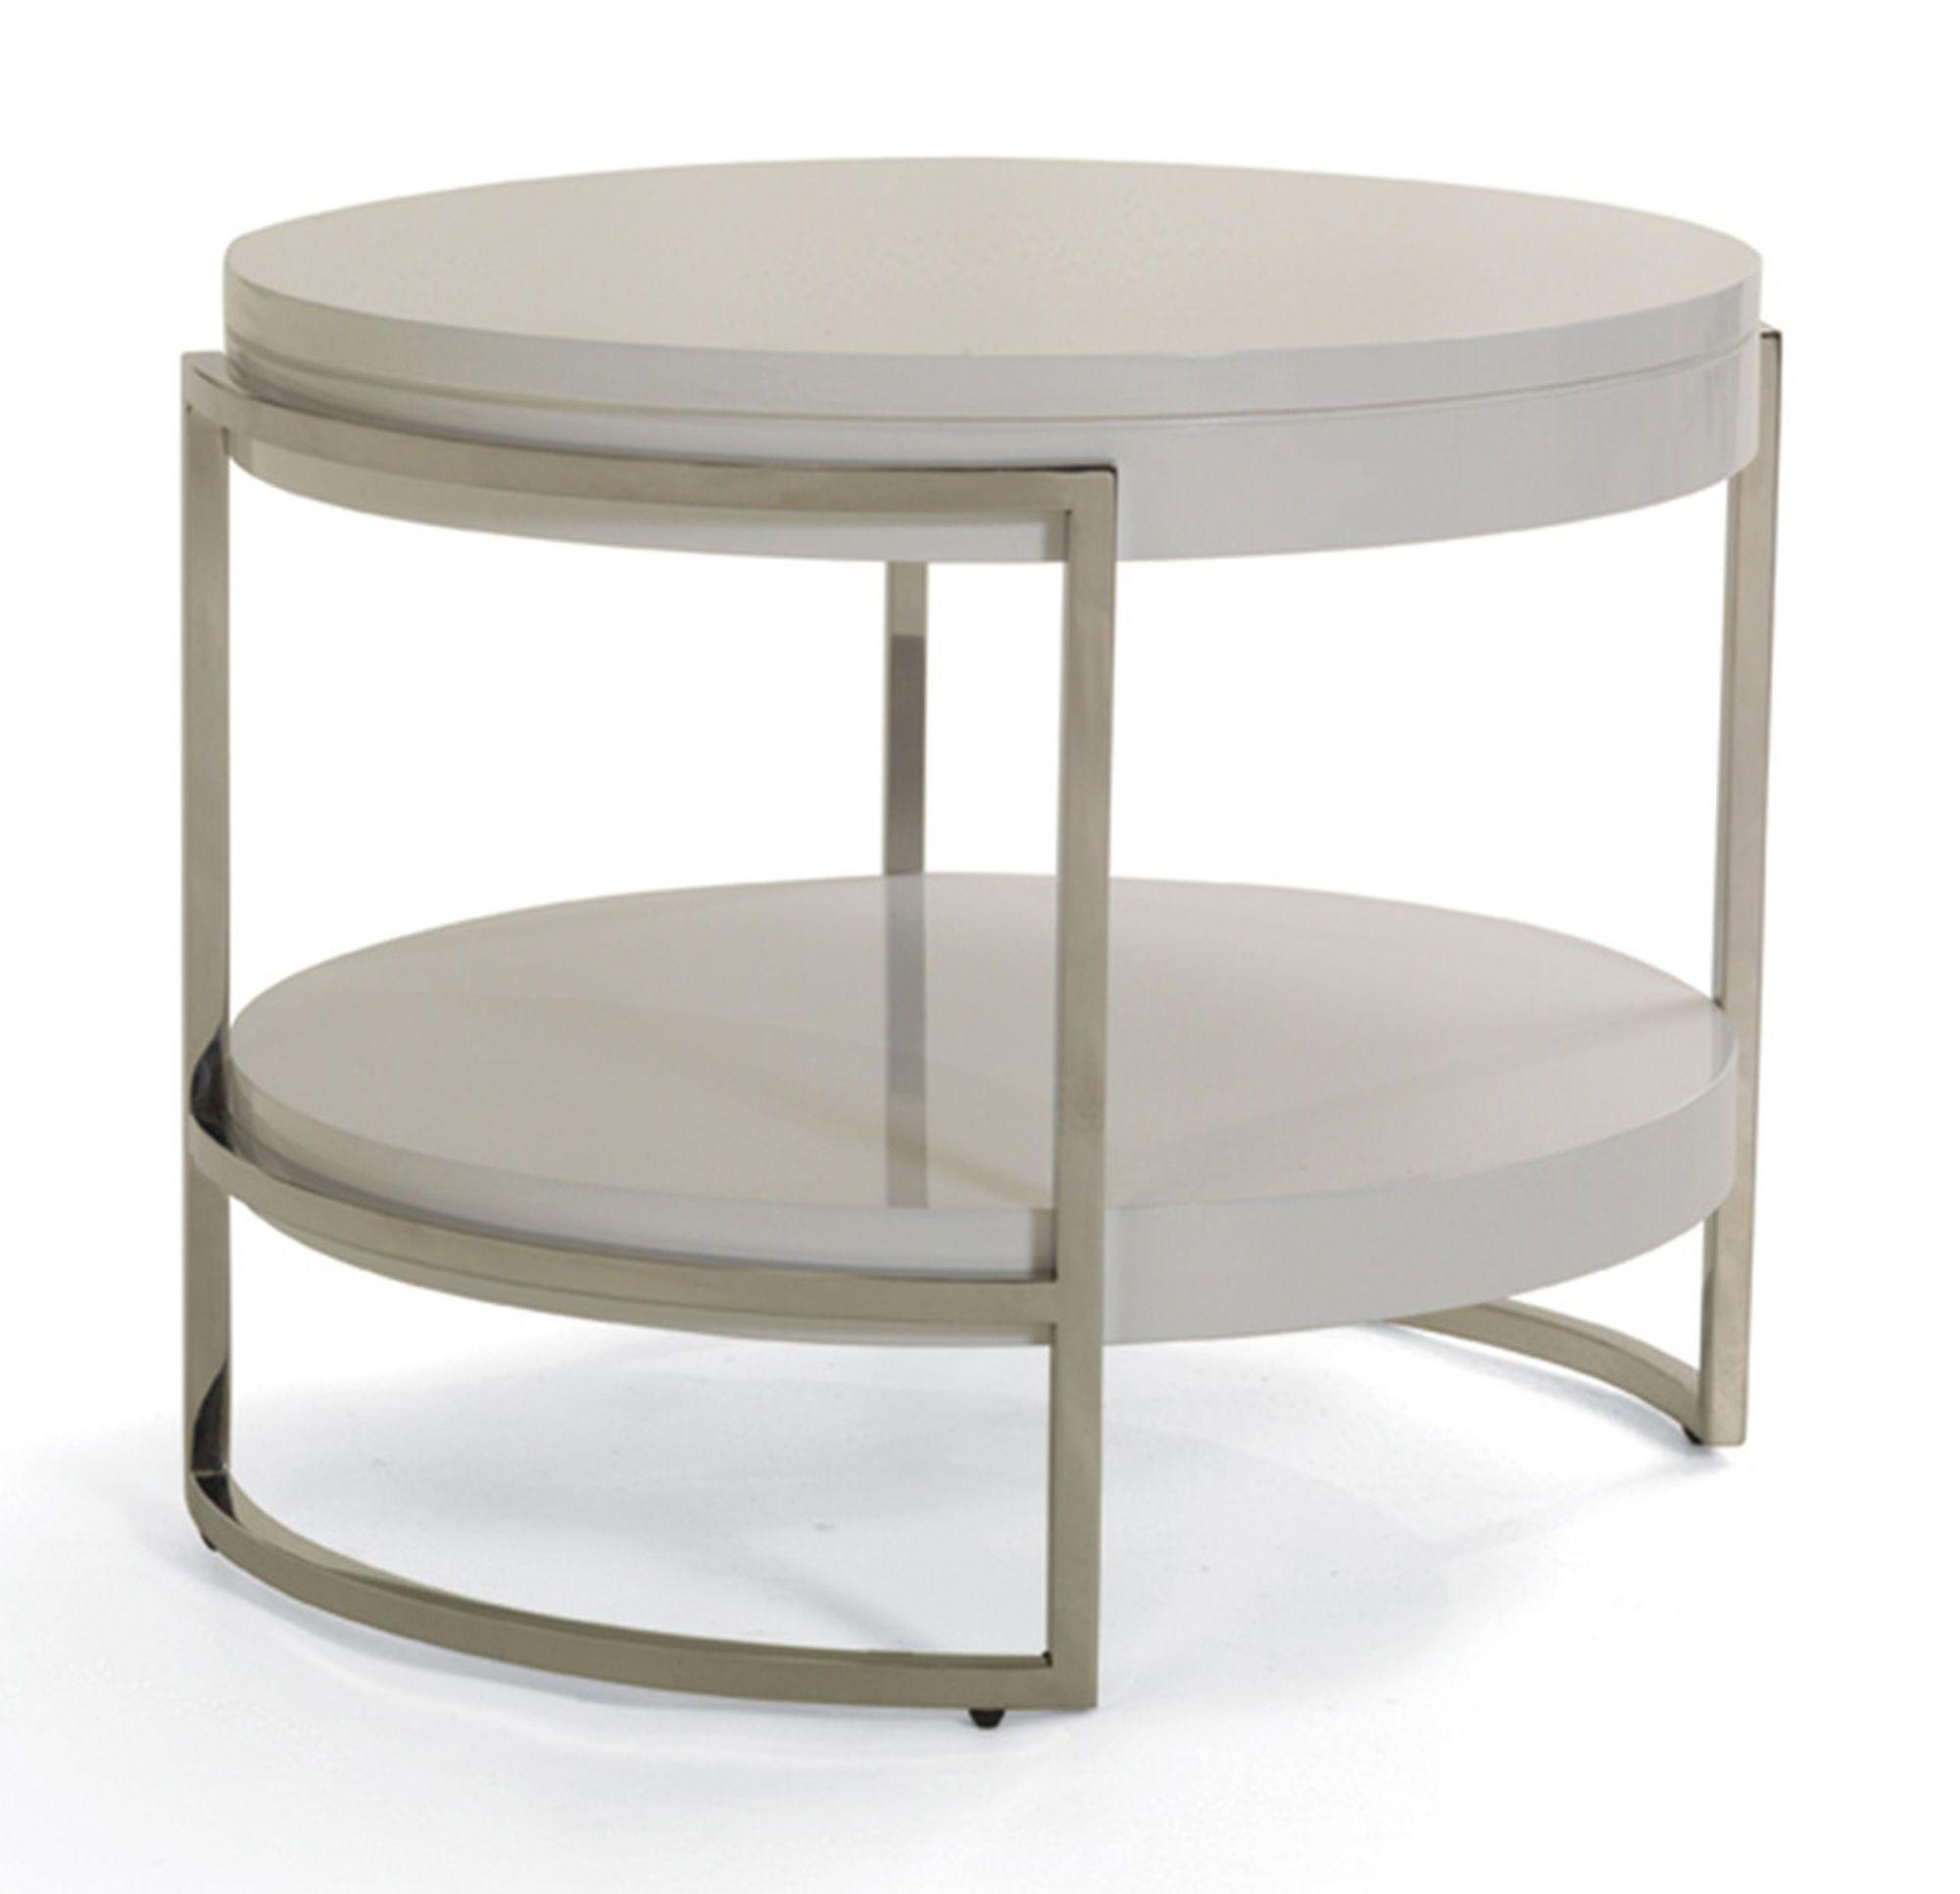 LAWSON ROUND SIDE TABLE hi res finish sugar materials white